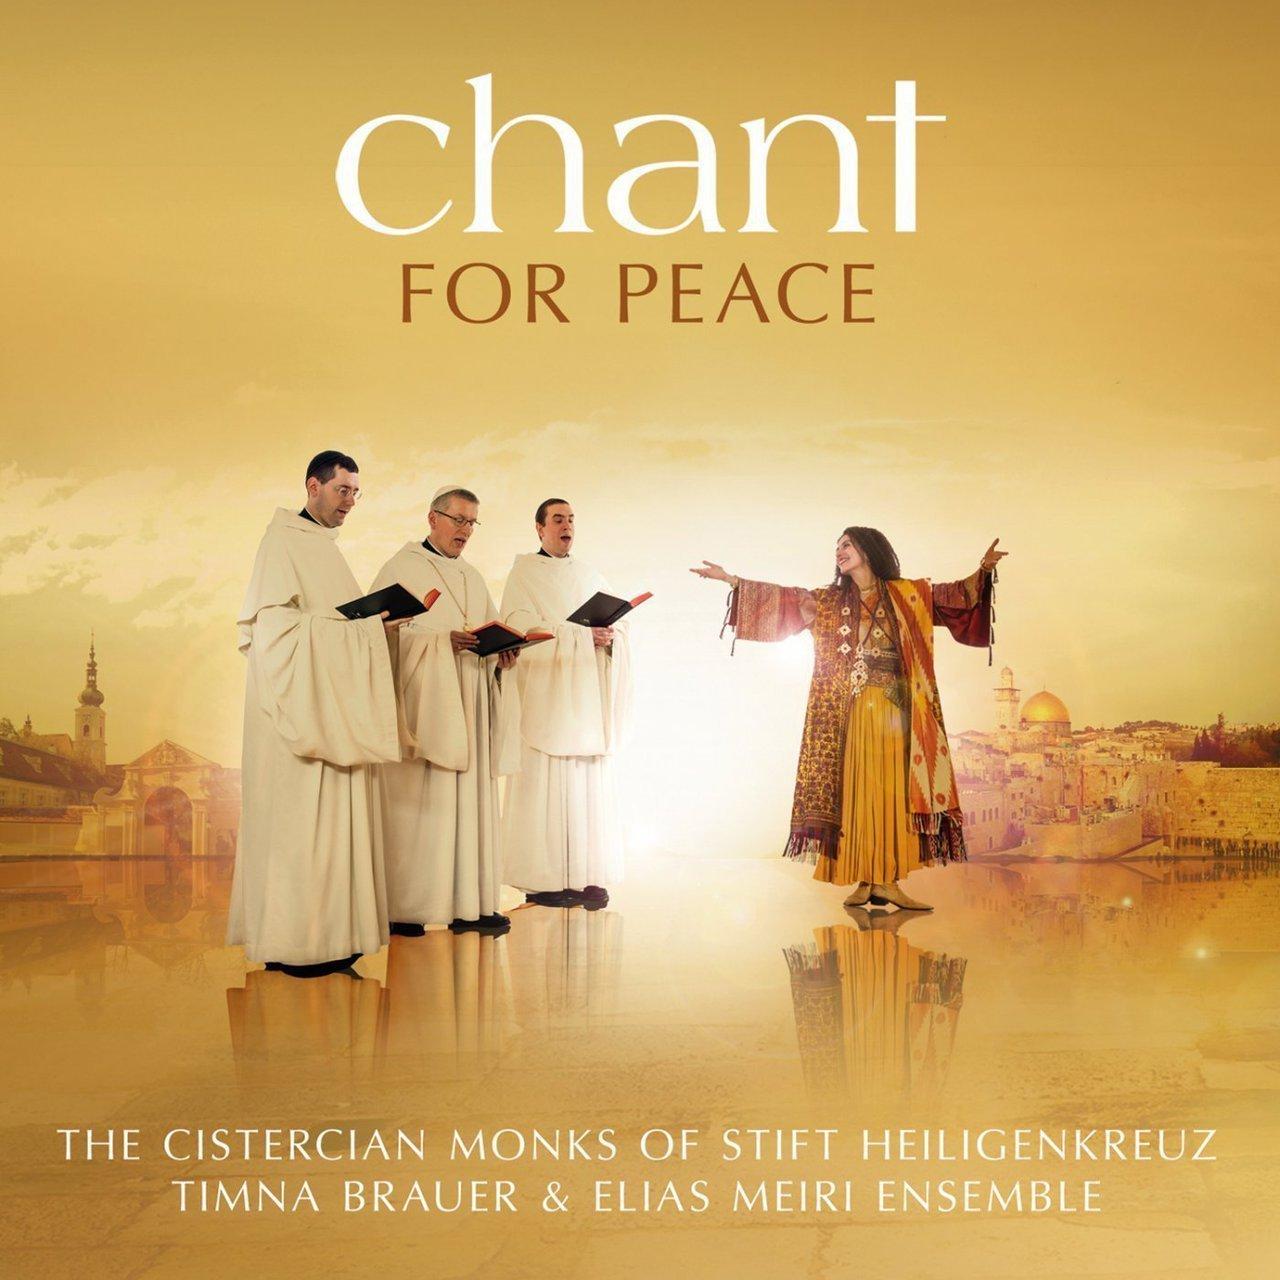 Chant  for peace by cistercian monks of stift heiligenkreuz